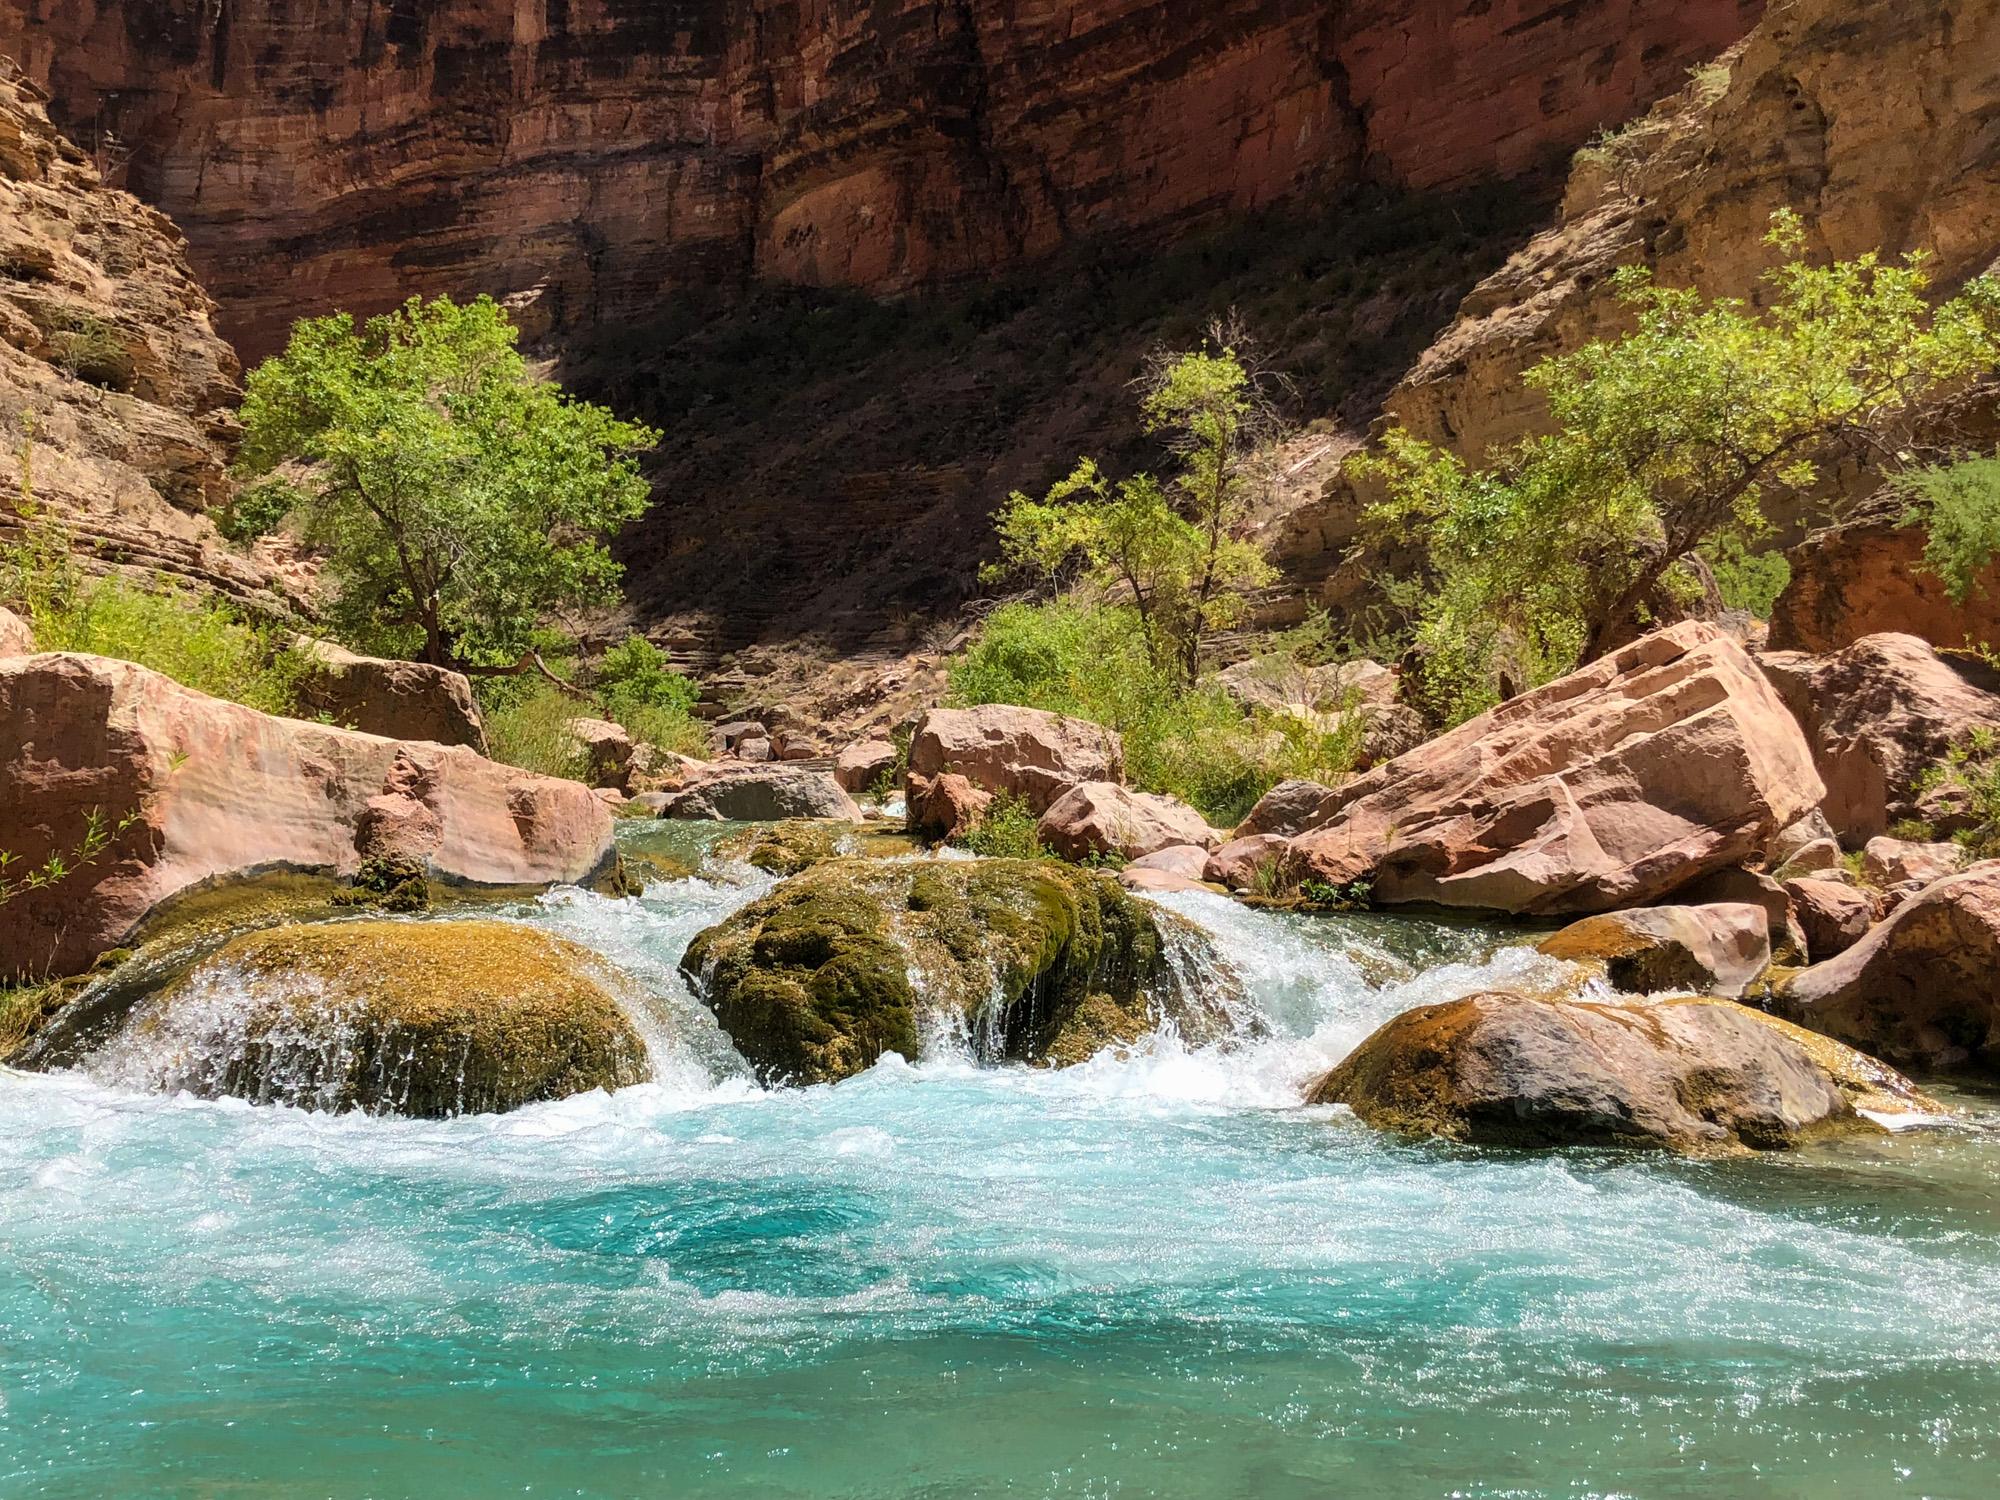 Blue Green water of Havasu Creek